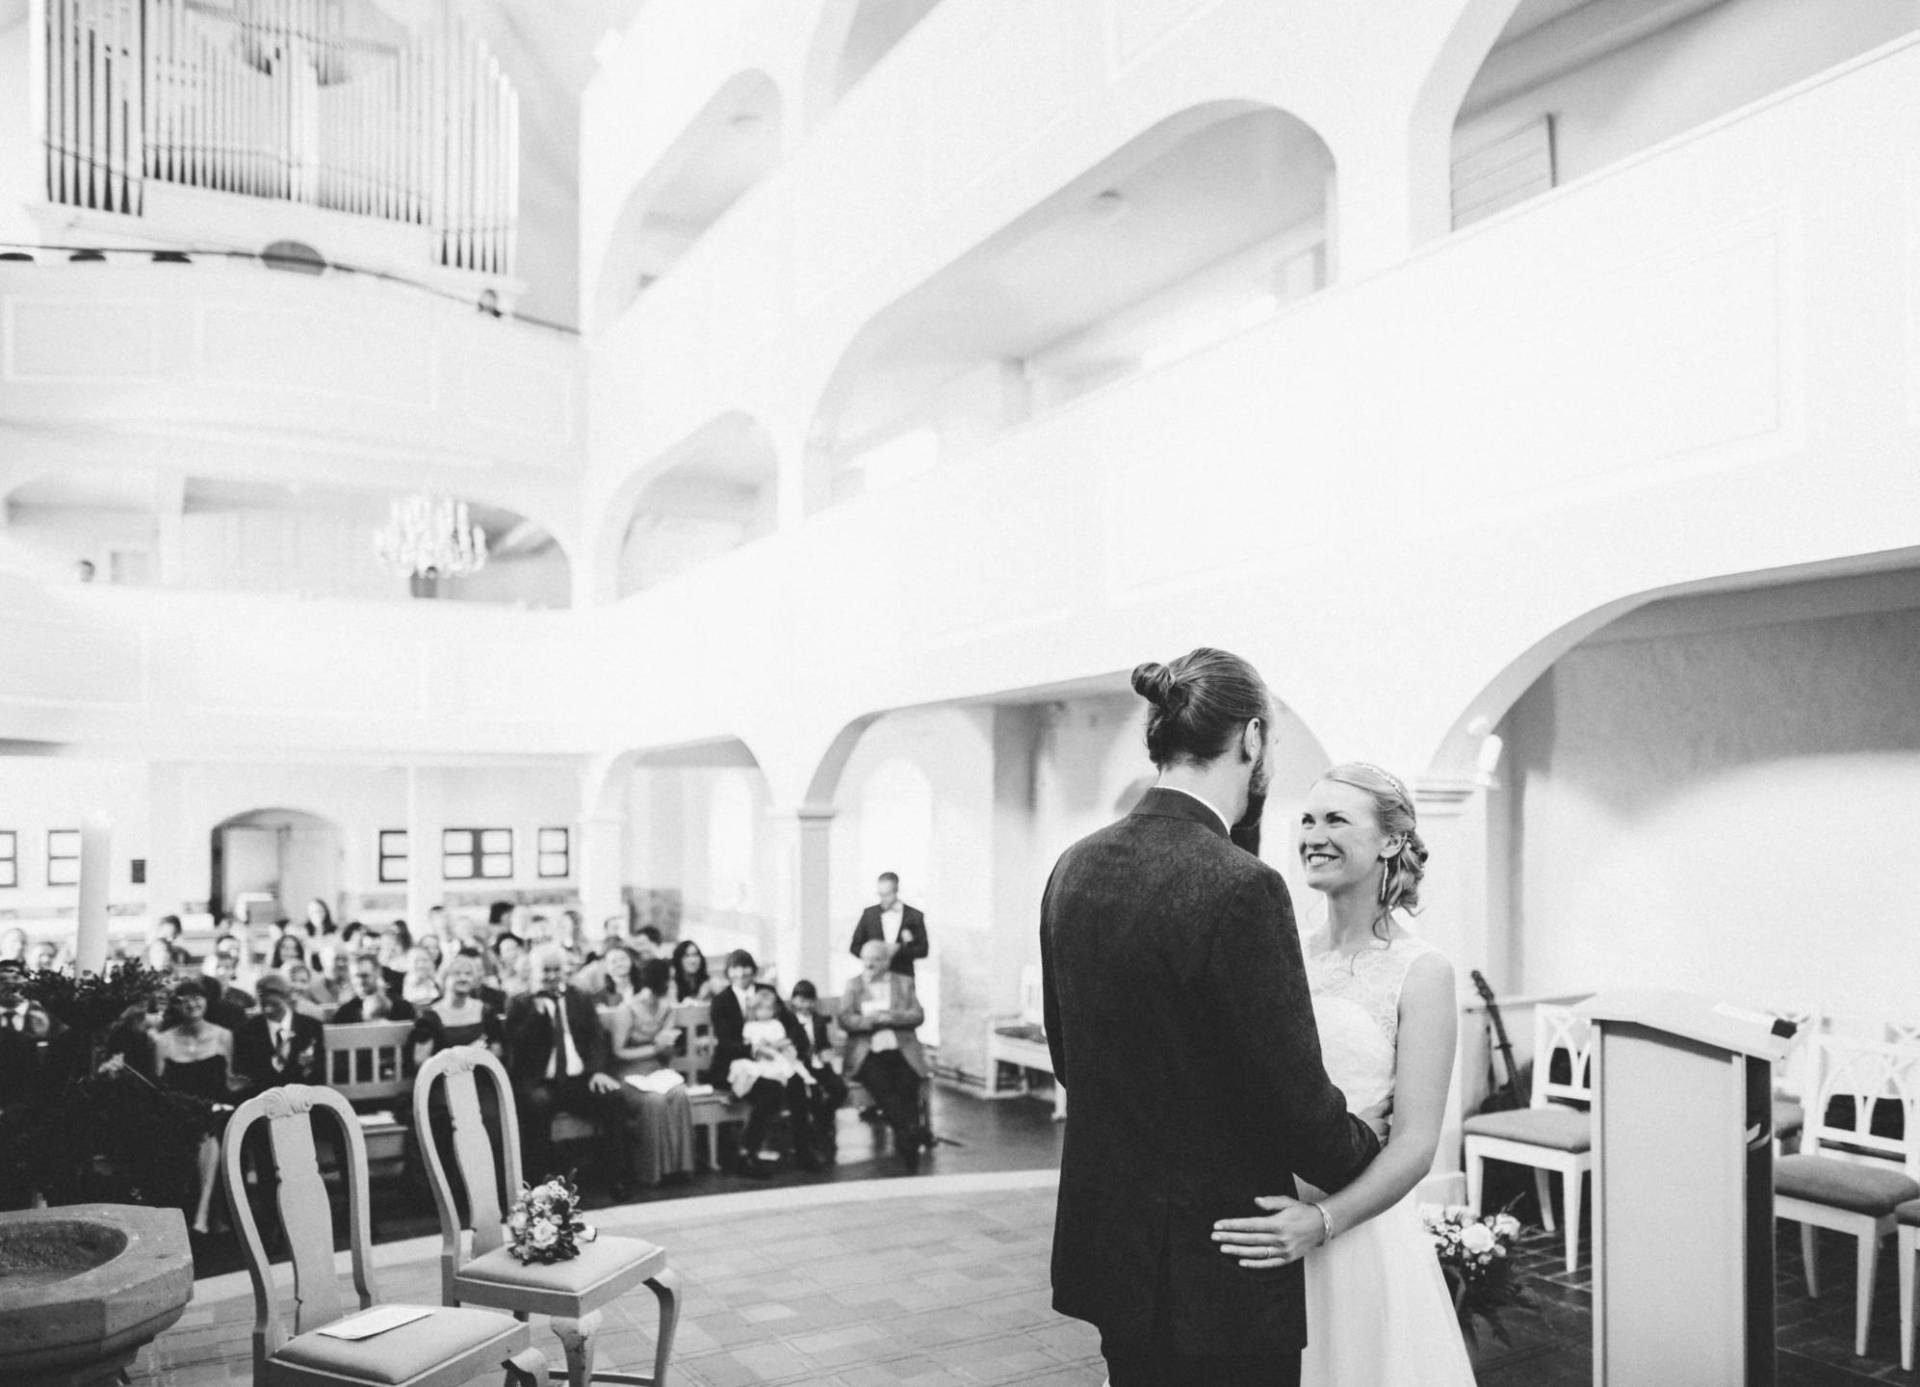 JuleSascha 12 1920x1387 - Hochzeit im alten Dornburger Schloss